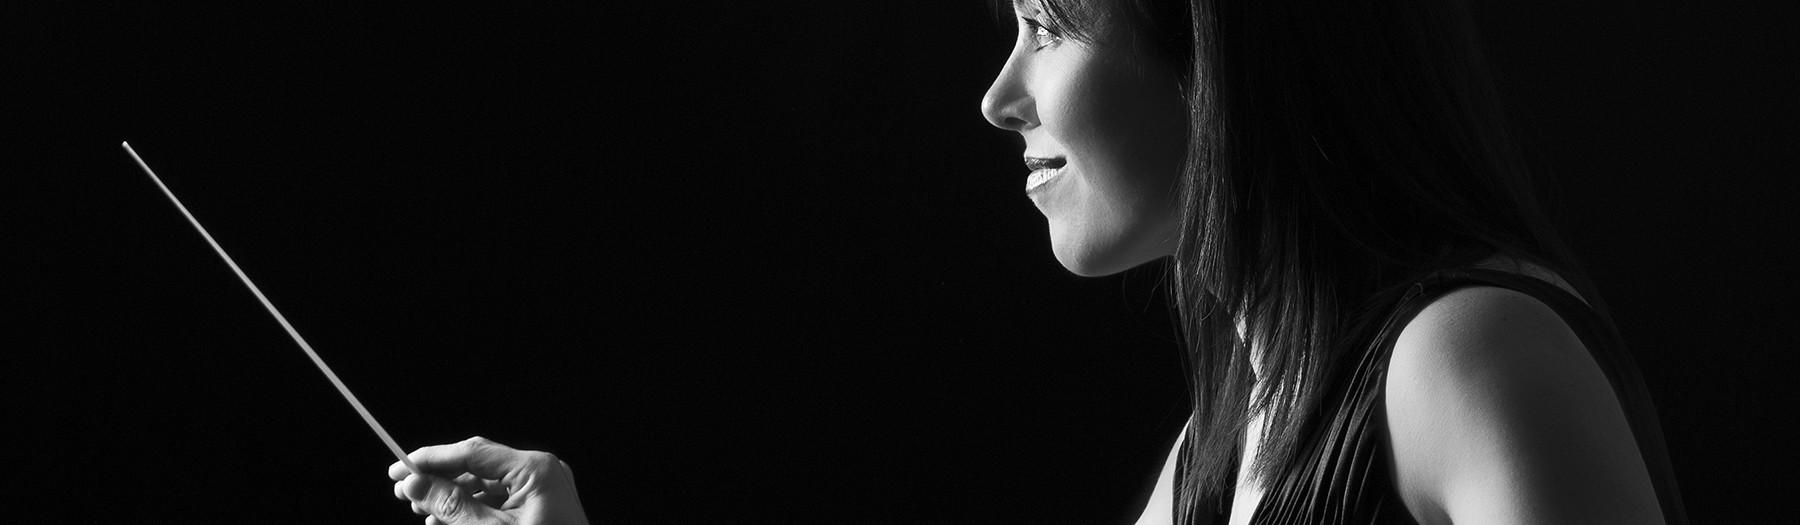 Virginia - Directora Orquesta Sinfónica de Murcia.